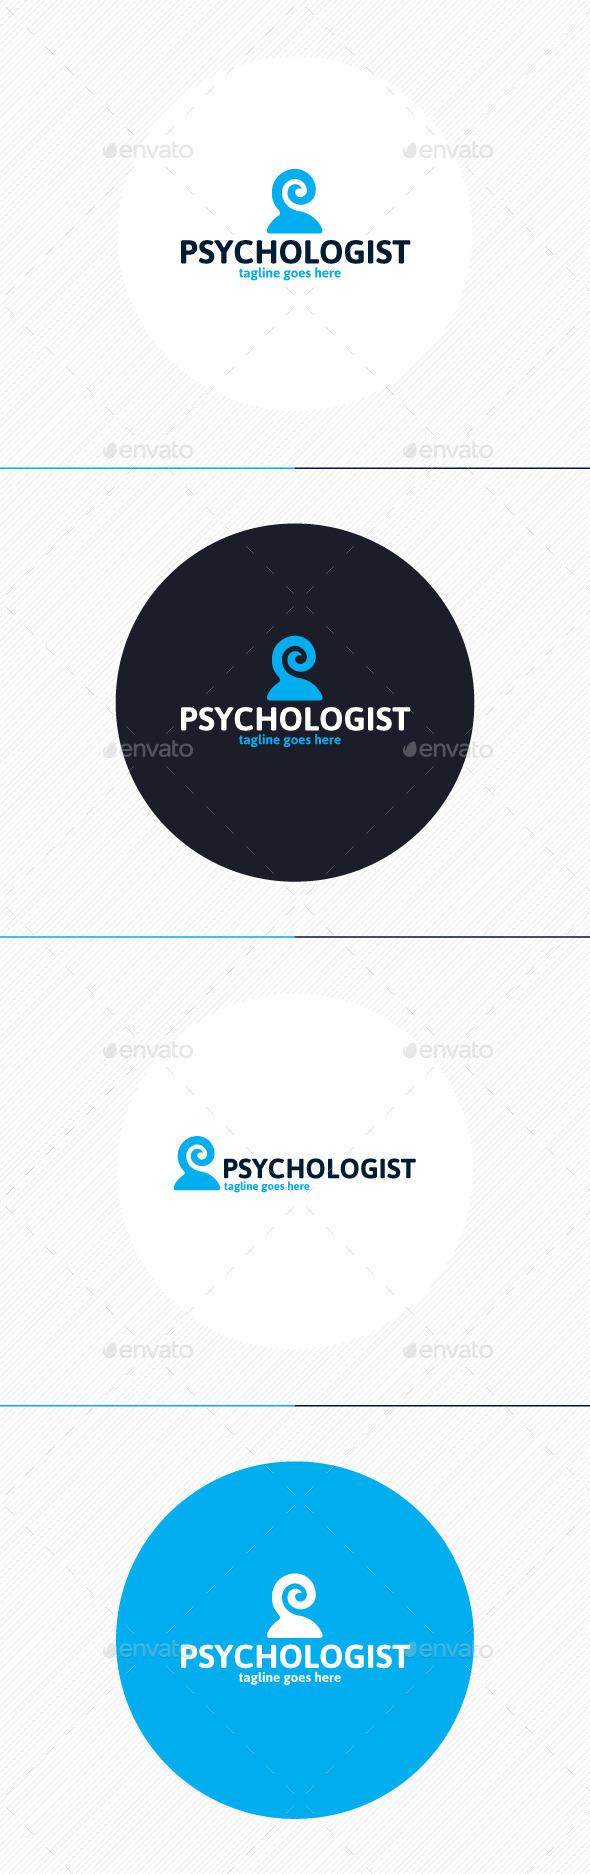 GraphicRiver Psychologist Logo 9860899